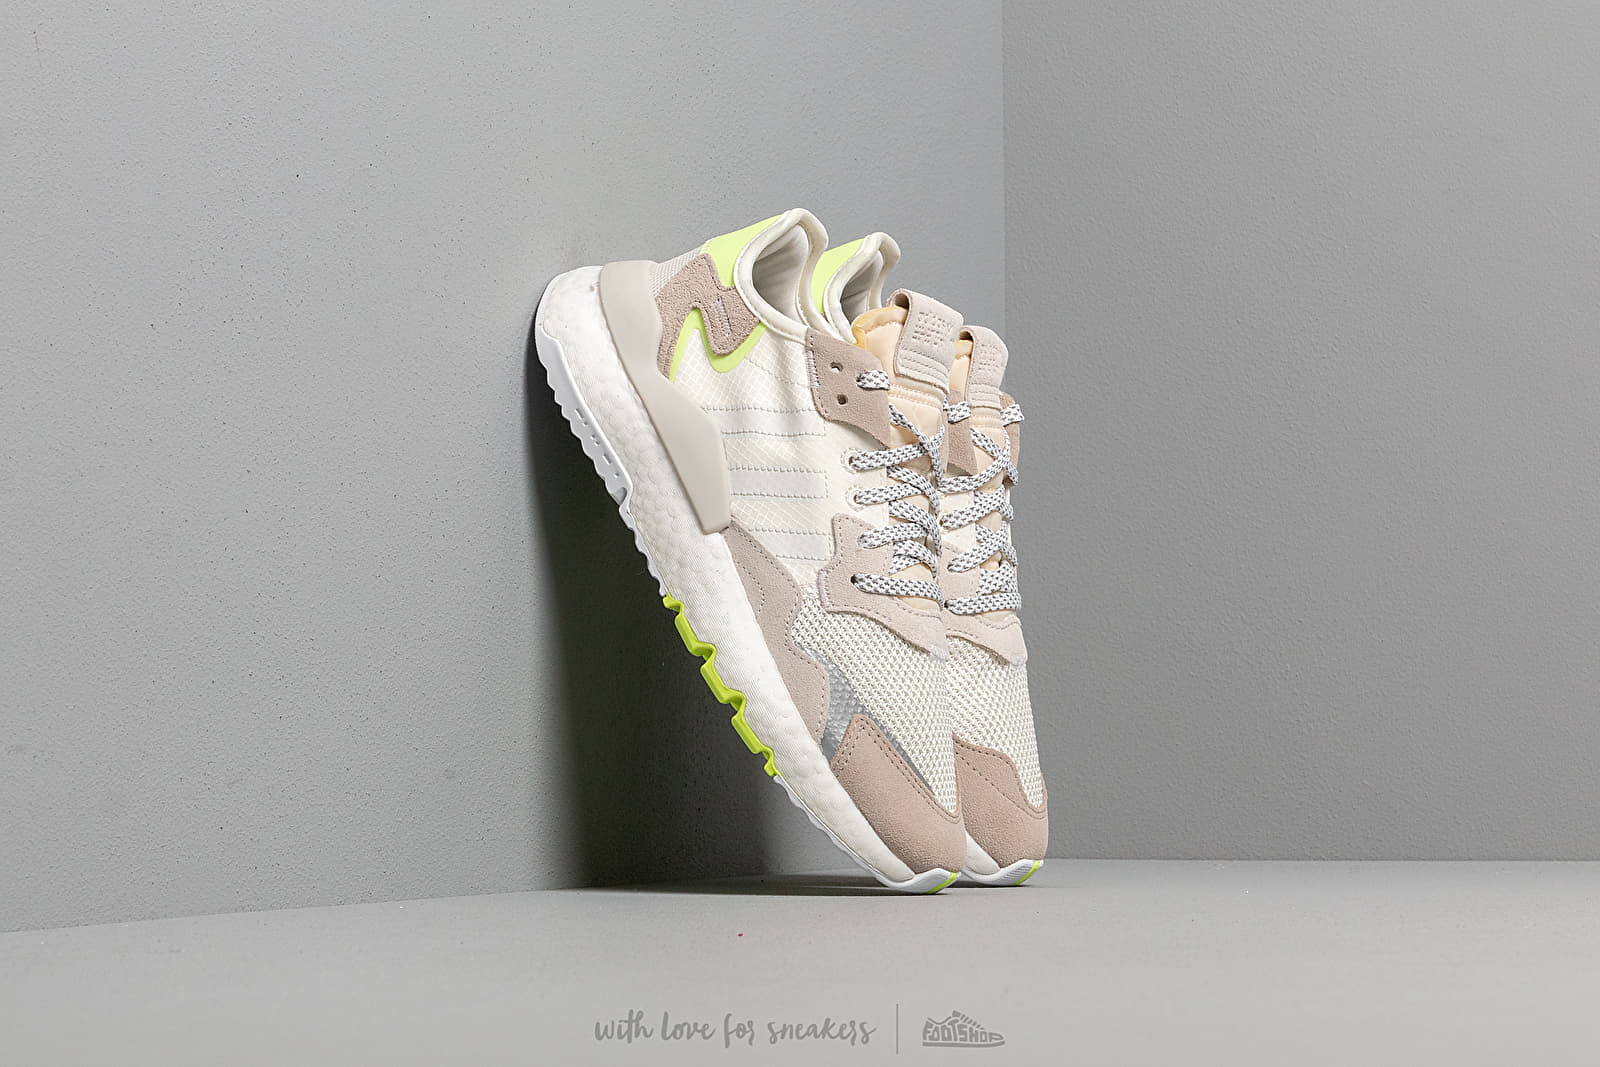 adidas Nite Jogger W Off White/ Ftw White/ Hi-Res Yellow za skvělou cenu 3 390 Kč koupíte na Footshop.cz